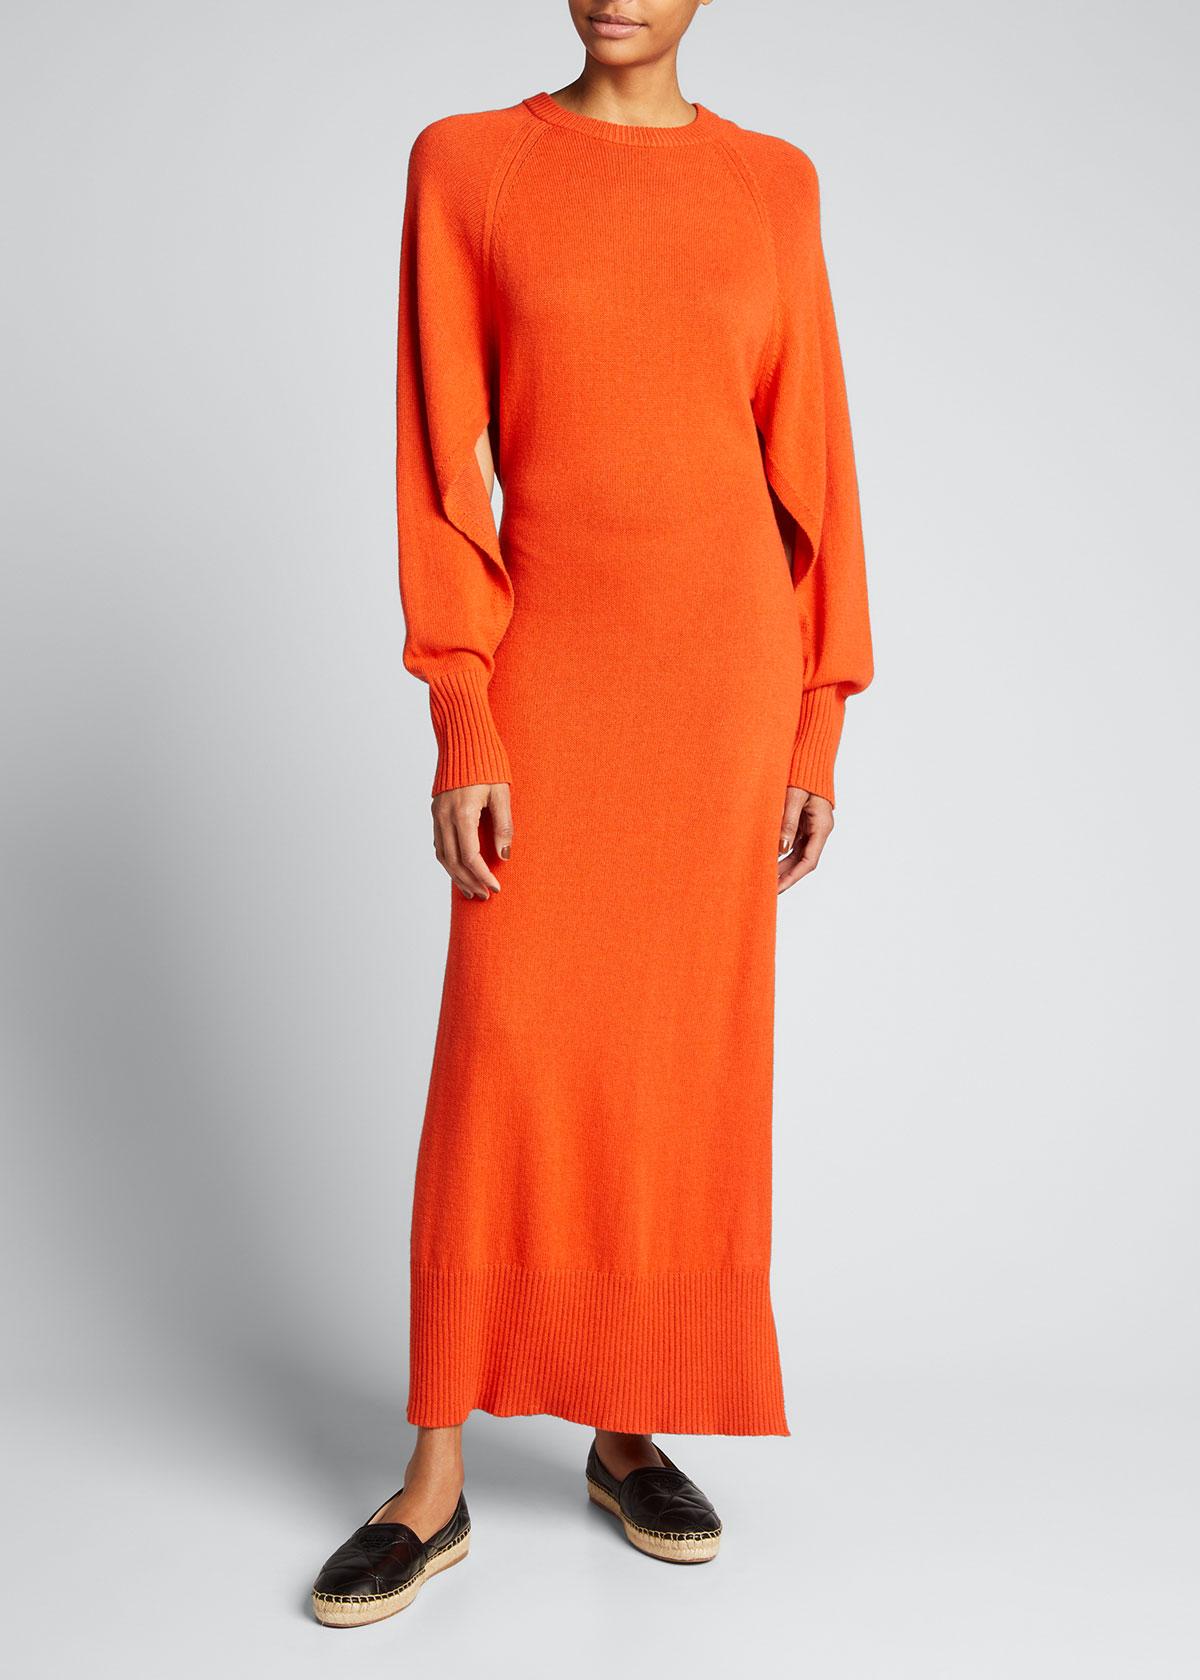 Altuzarra SLIT-SLEEVE WOOL-CASHMERE DRESS